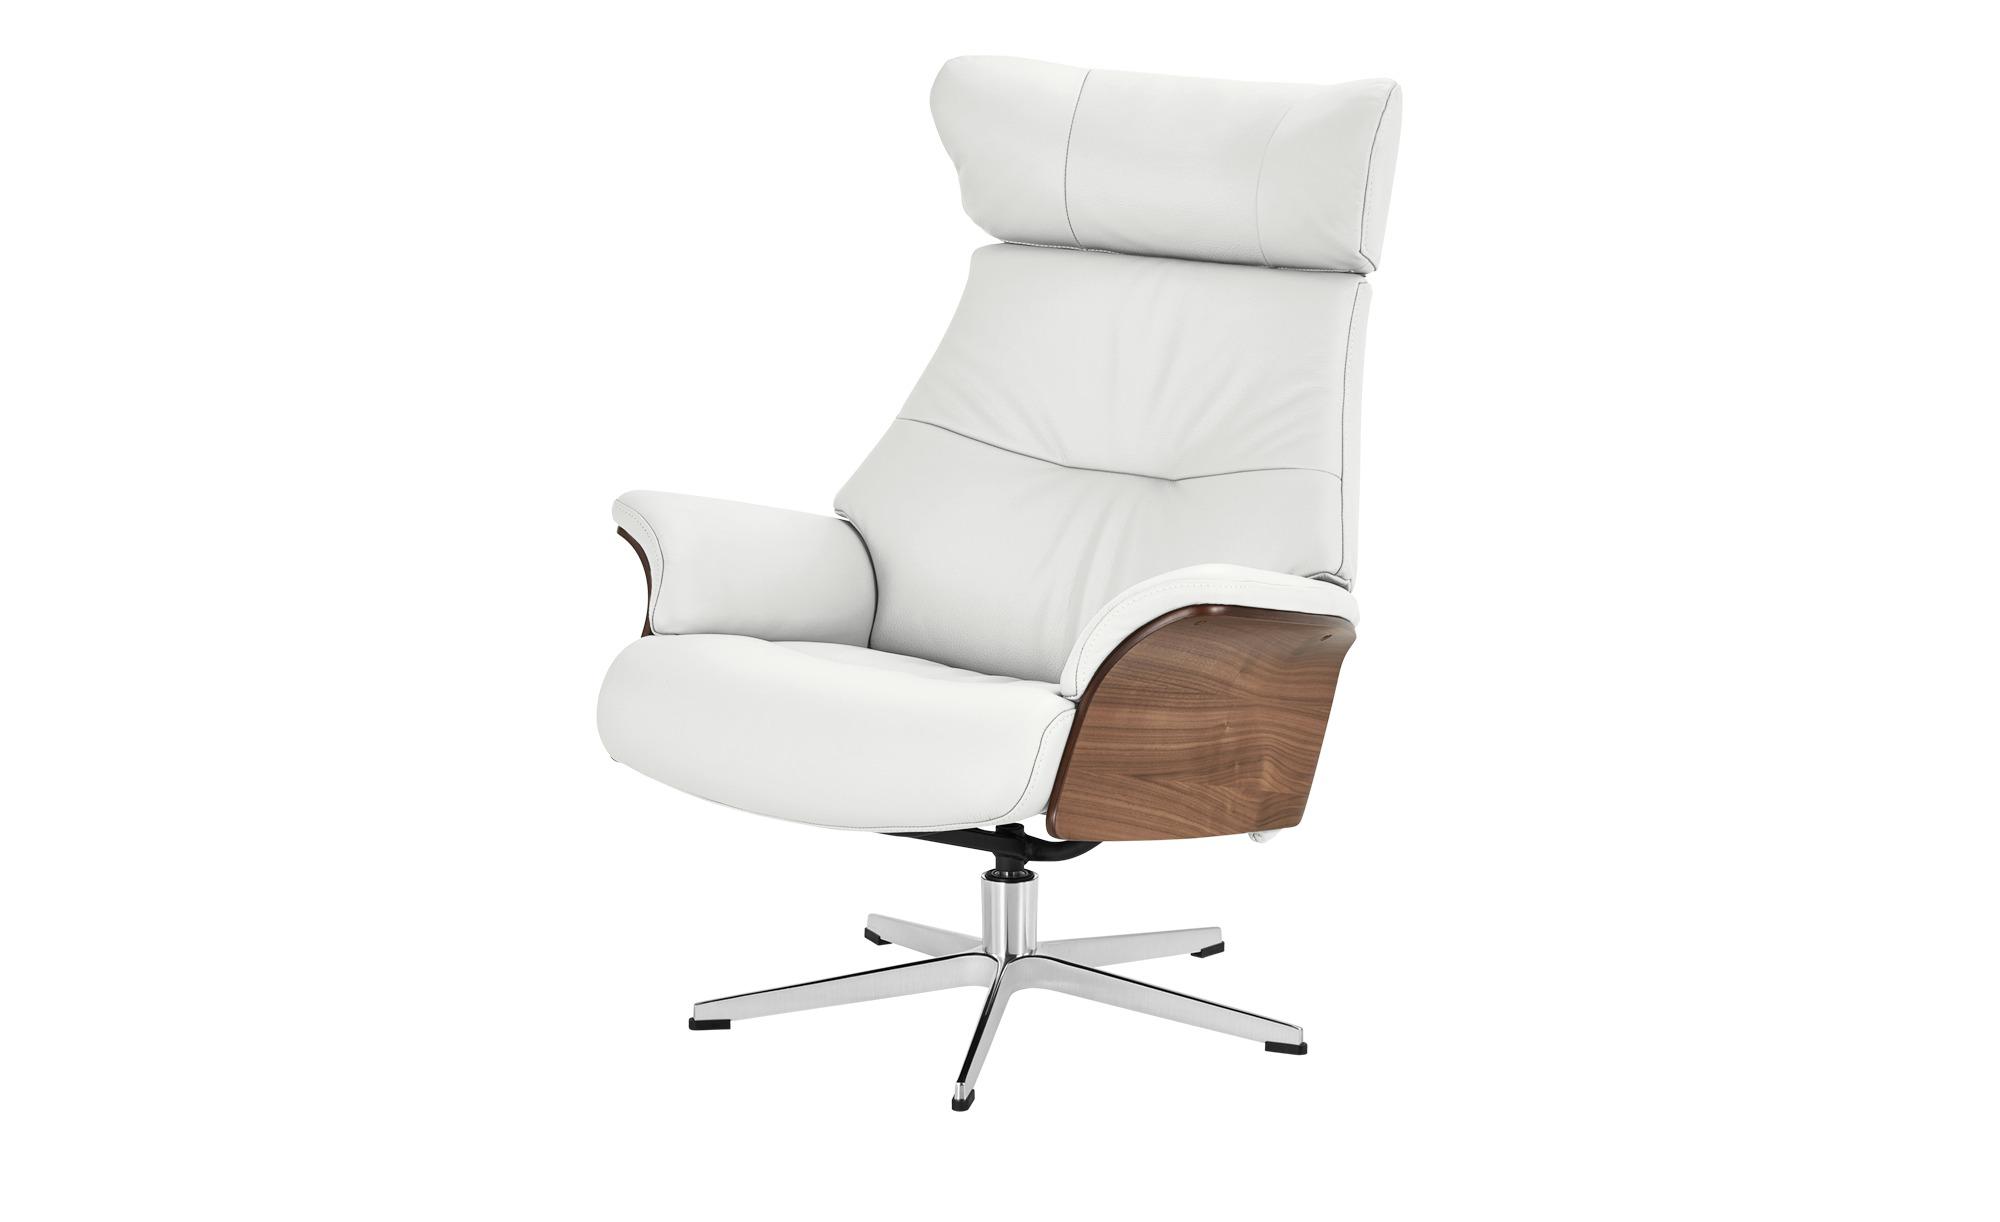 Relaxsessel weiß - Leder